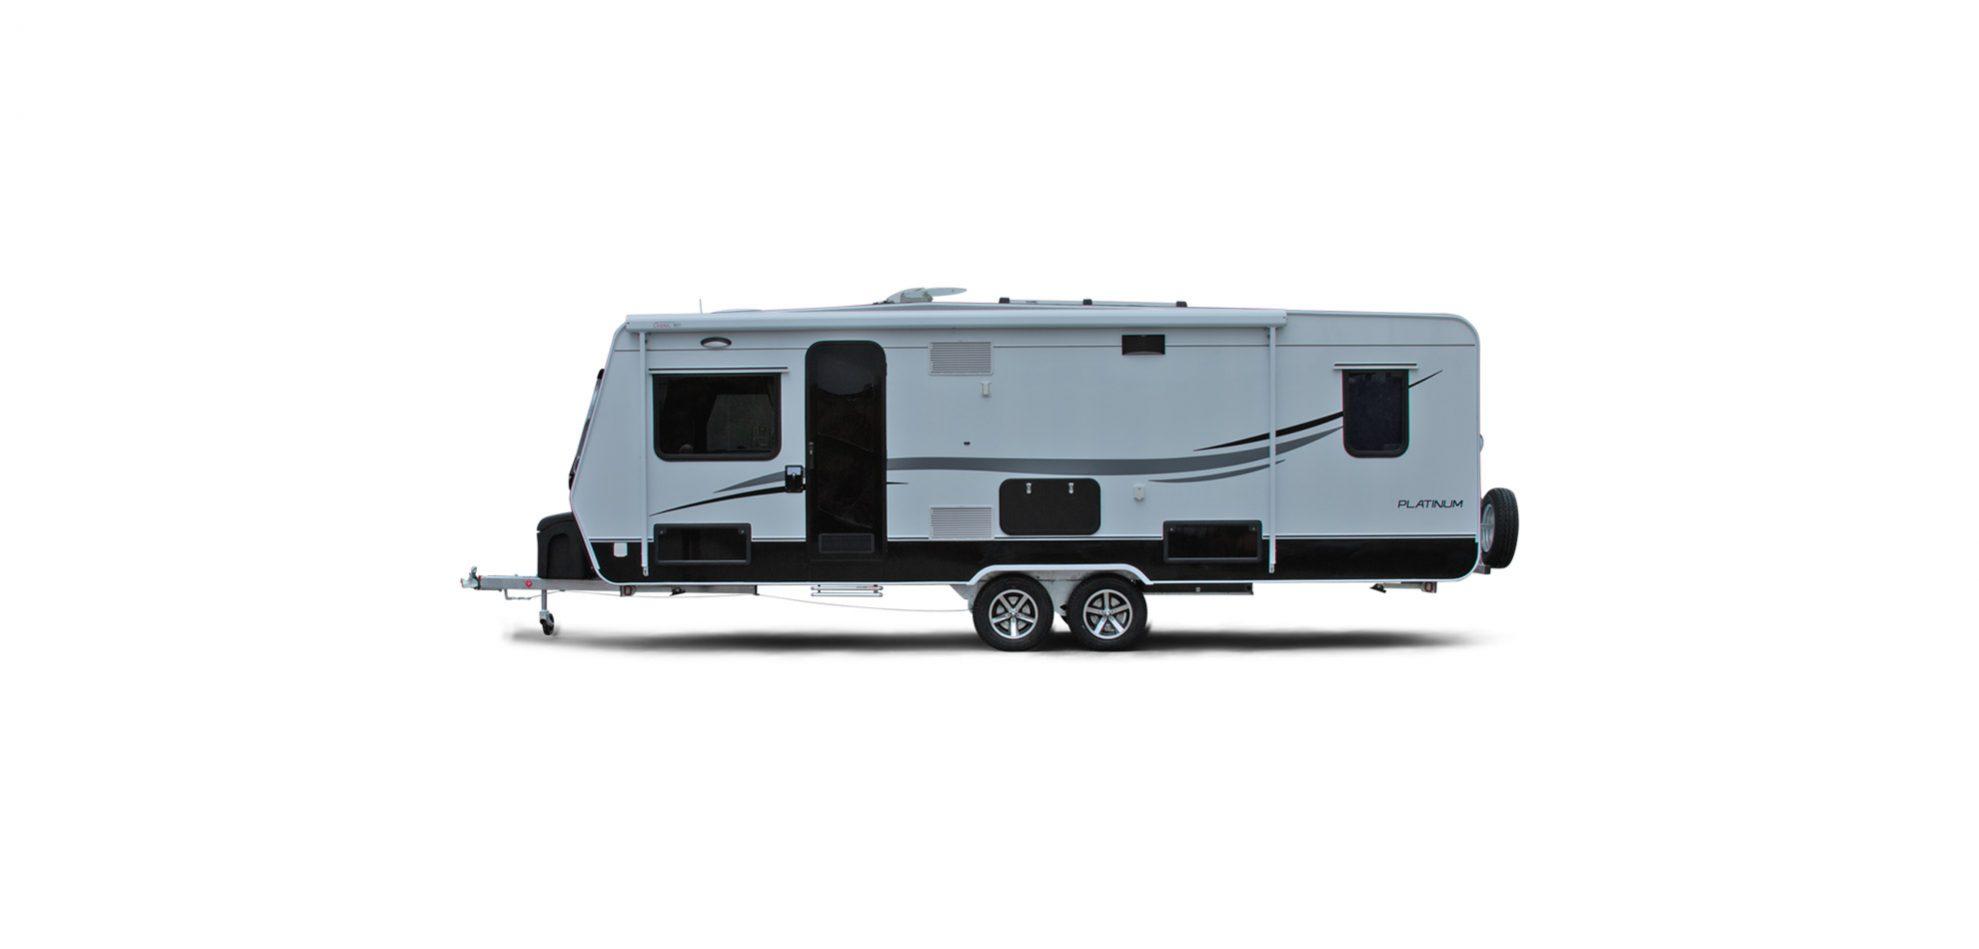 Leisureline Caravans – Kiwi Built With Pride